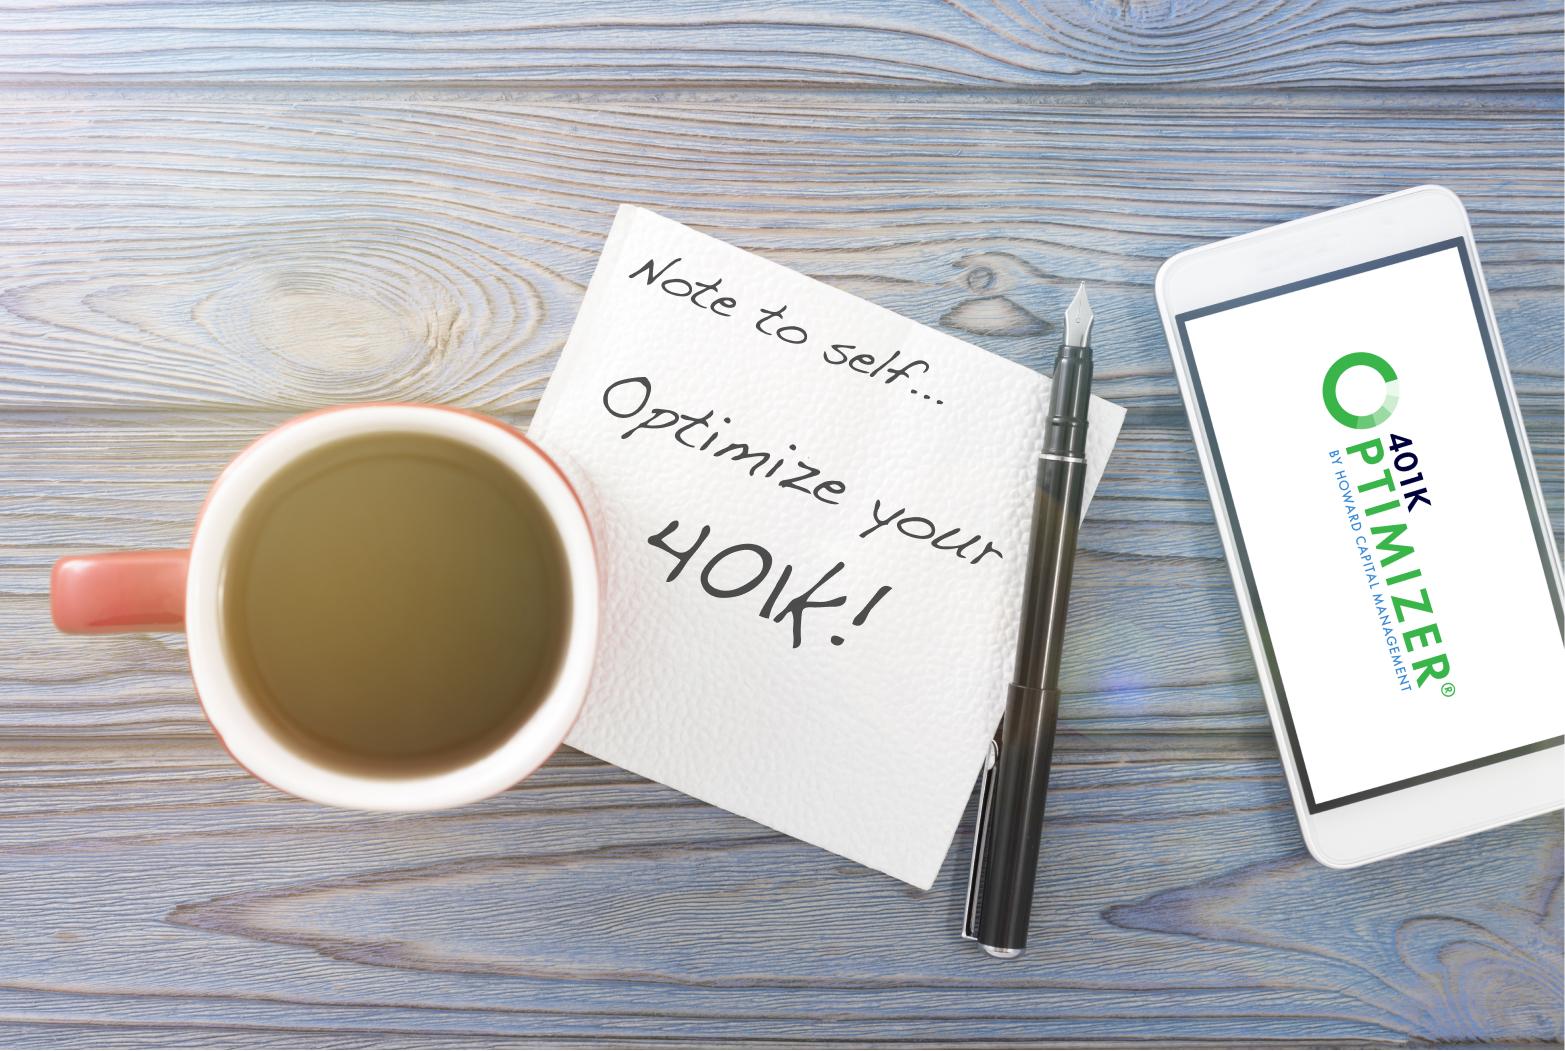 401k Asset Allocation Napkin